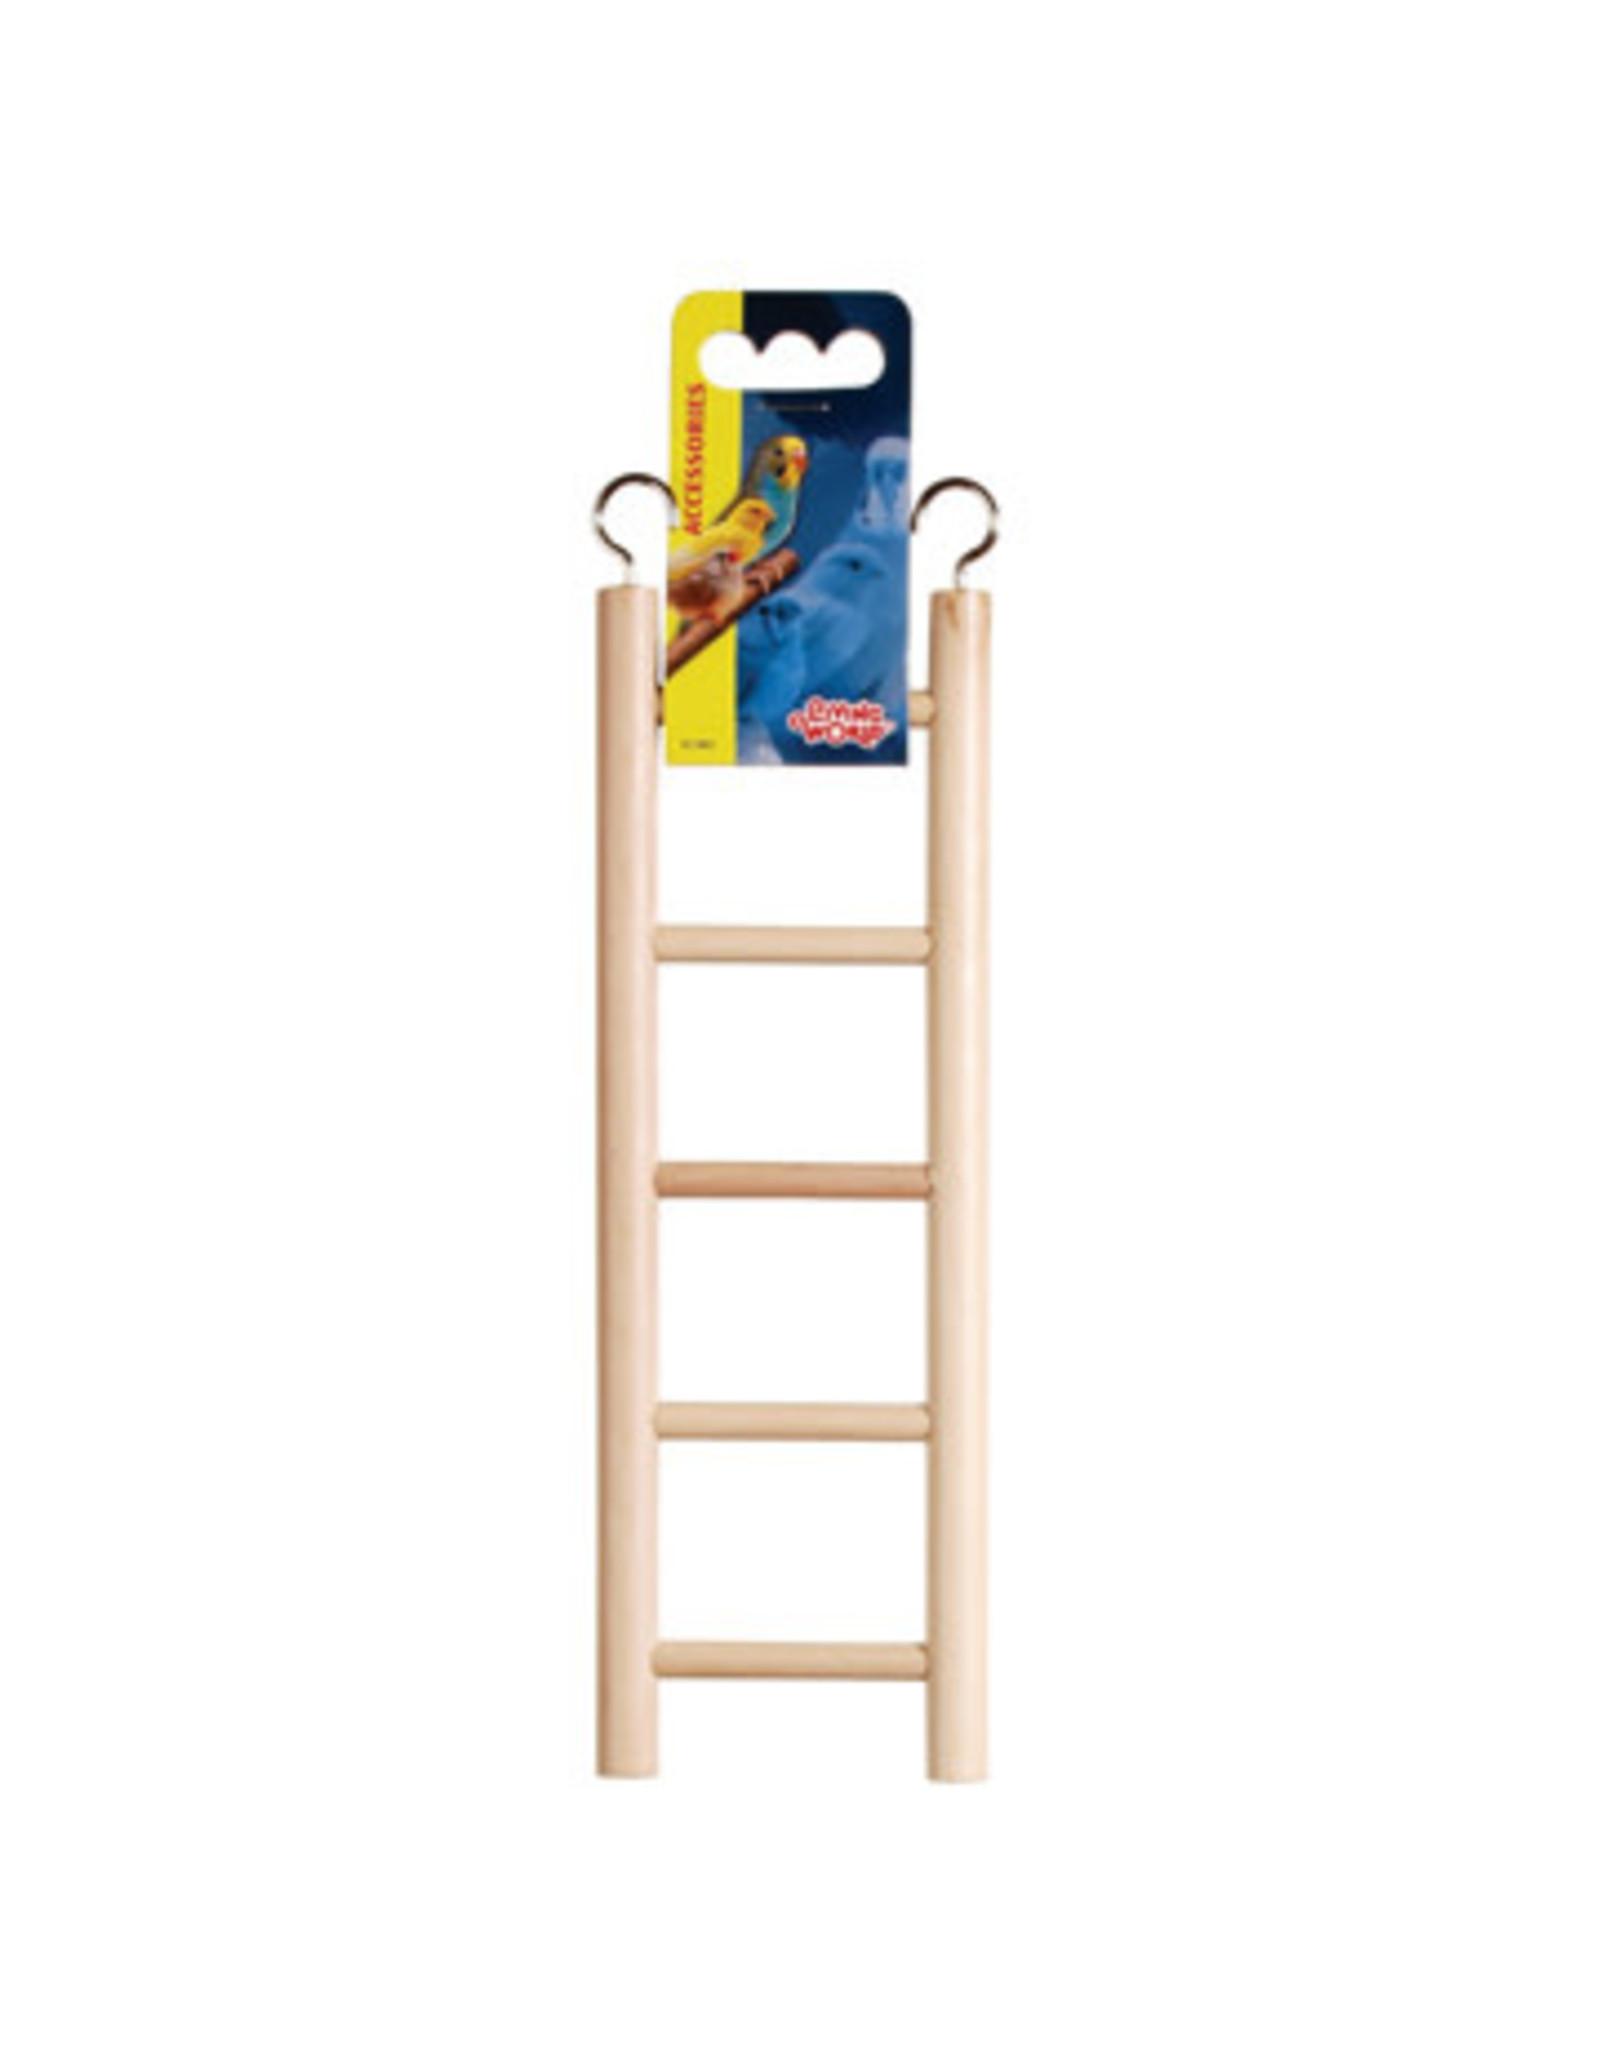 "Living World Living World Wooden Bird Ladder - 5 Steps - 25 cm (5.5"") Long"